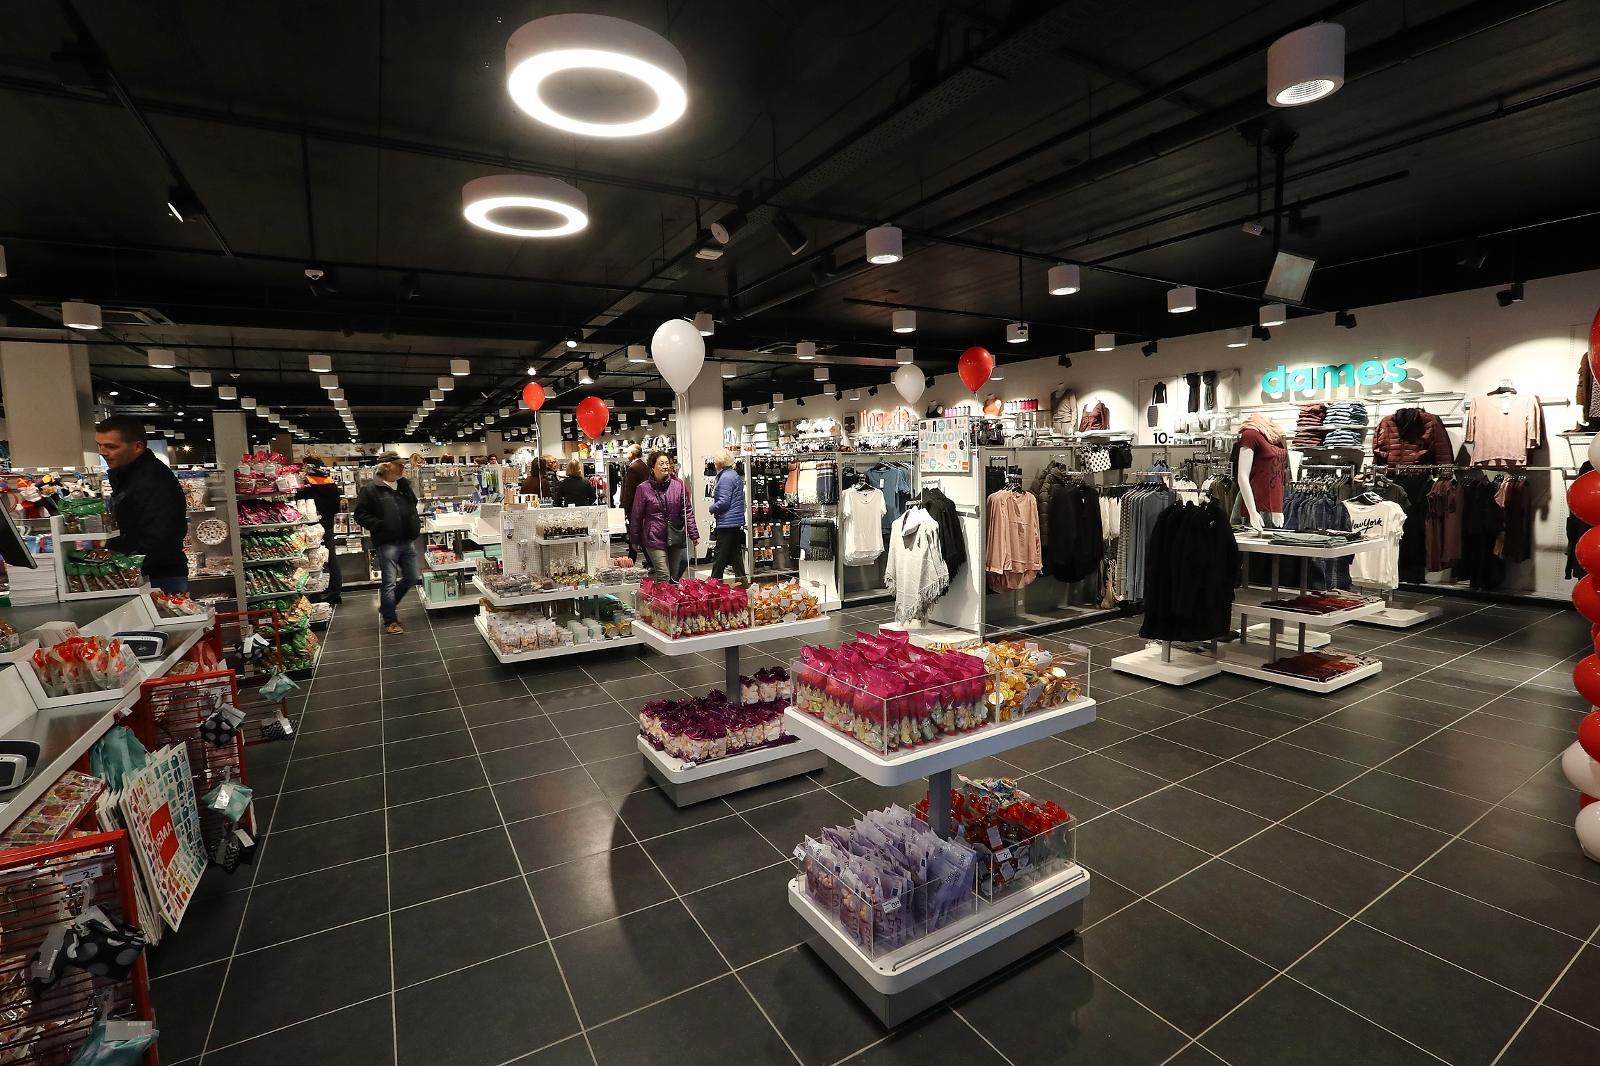 Badkamer Accessoires Hema : Hema bouwt alle winkels om naar internationale formule